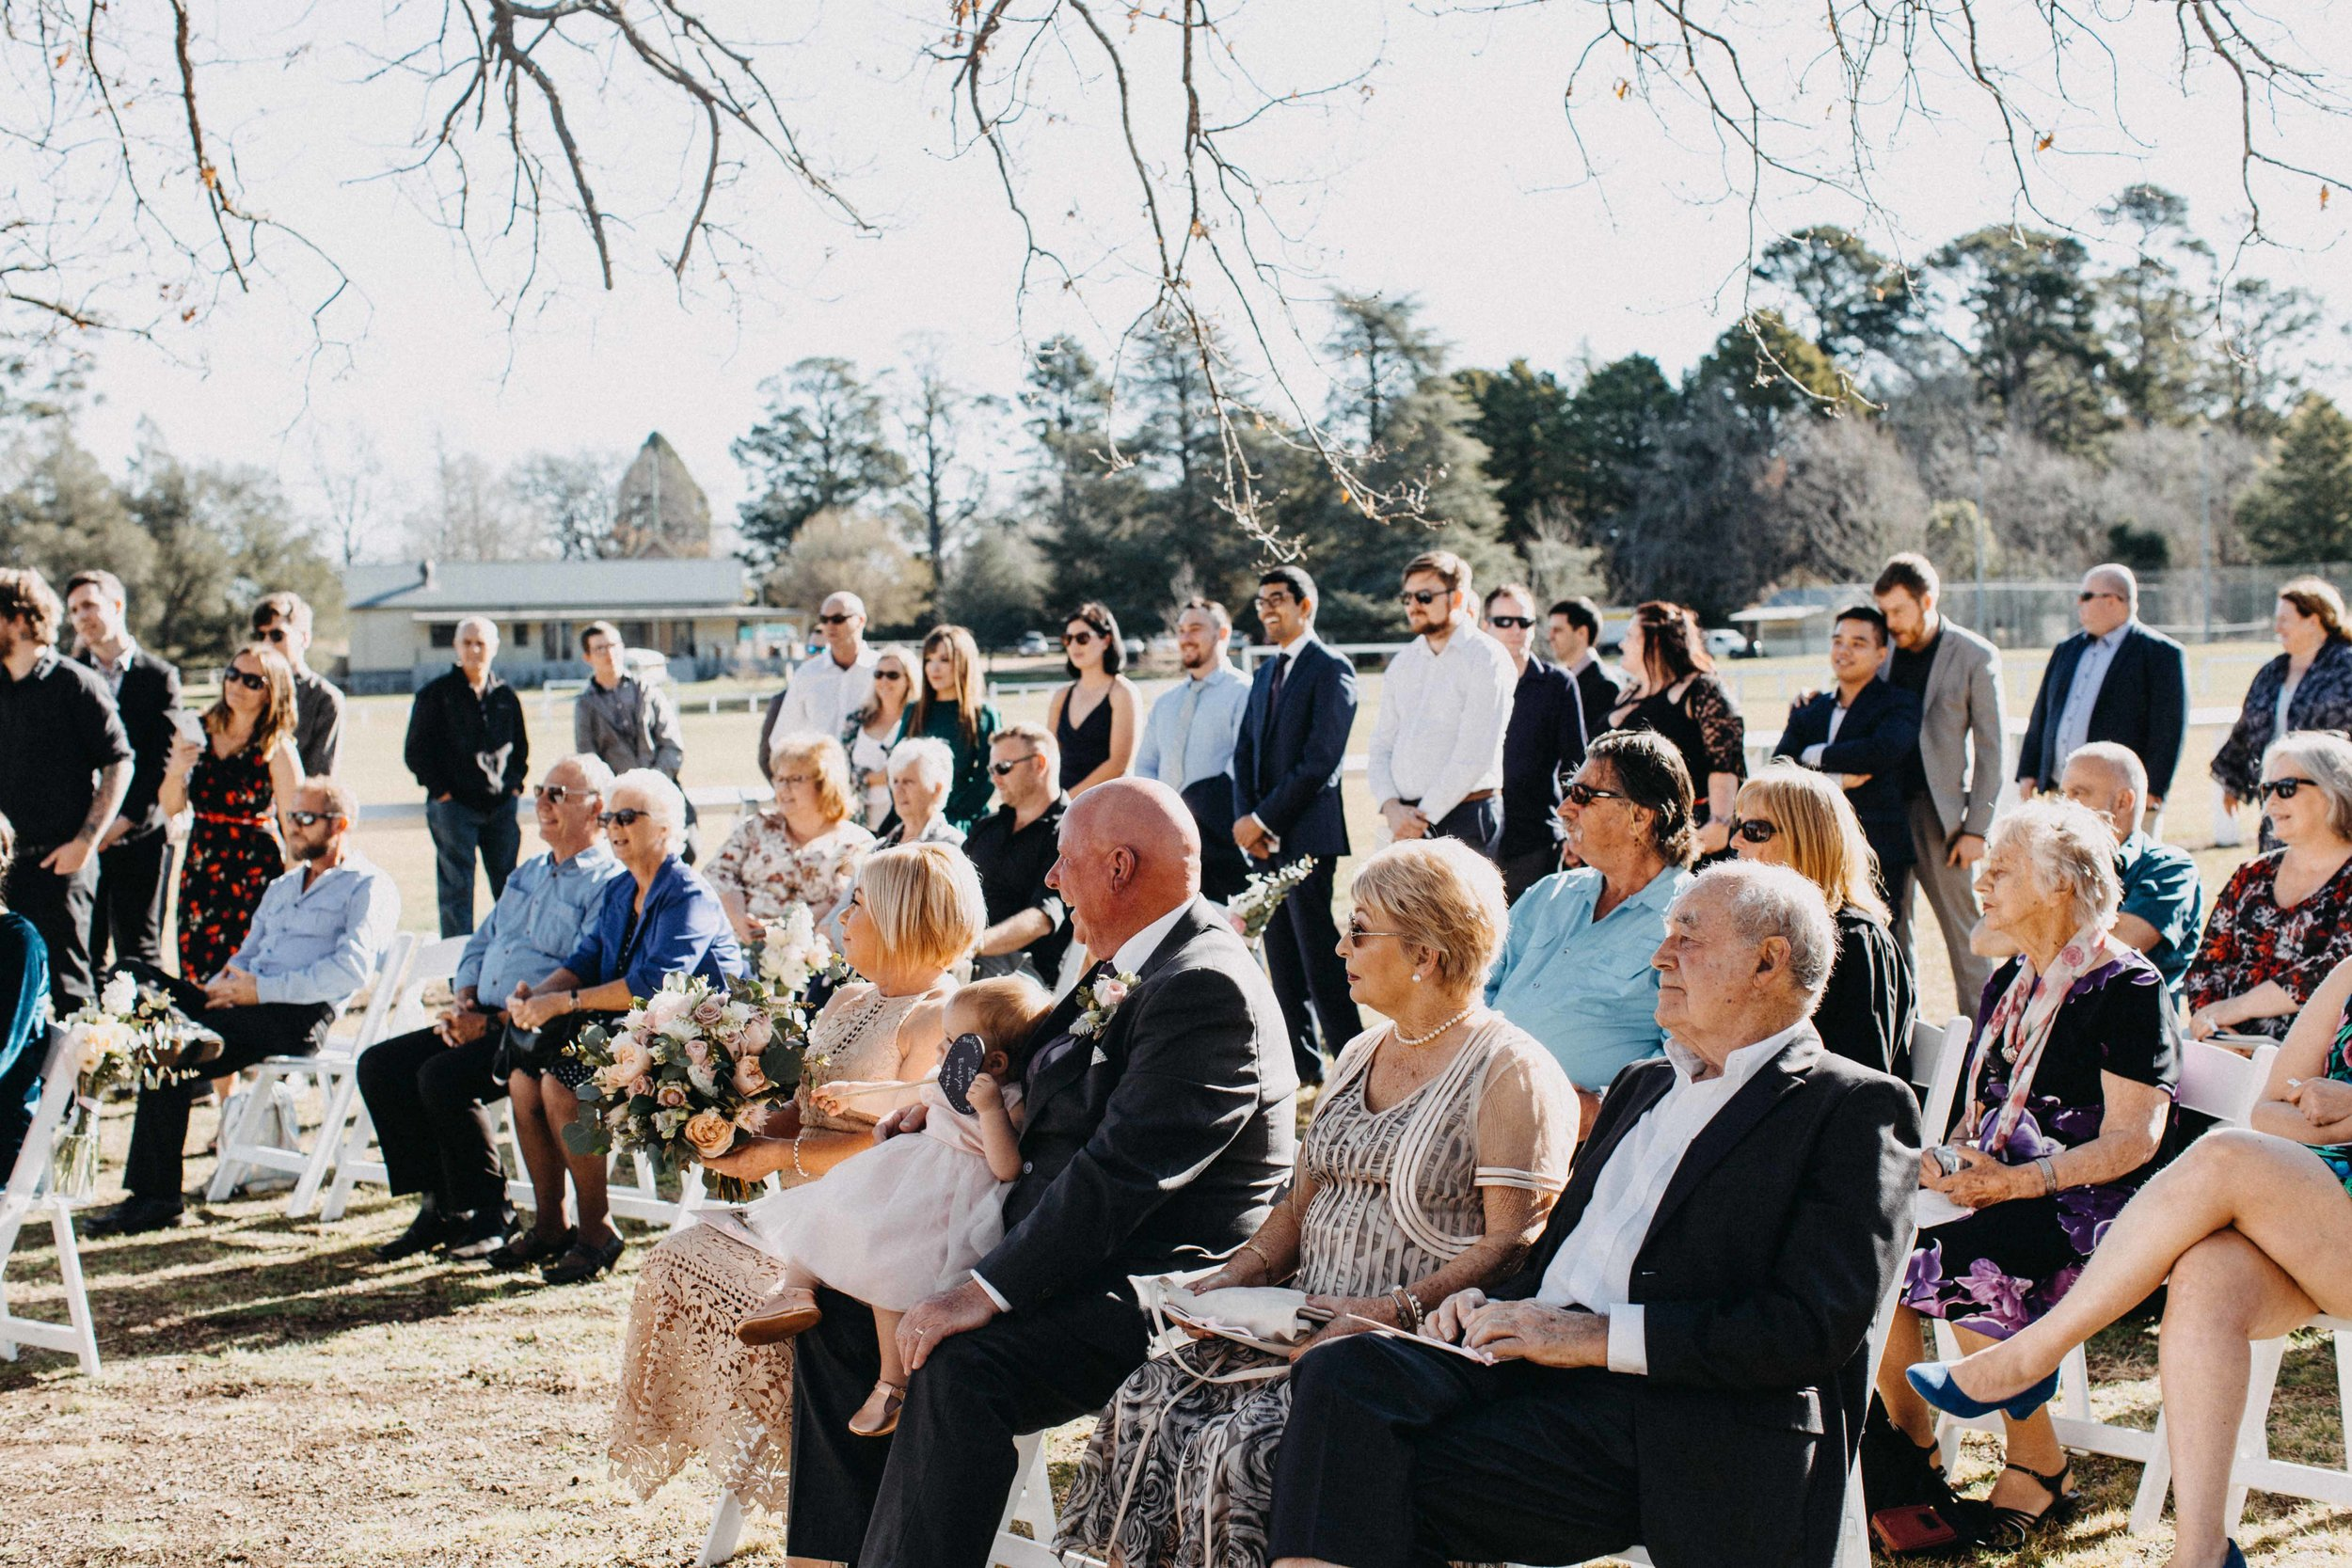 exeter-southern-highlands-wedding-www.emilyobrienphotography.net -57.jpg